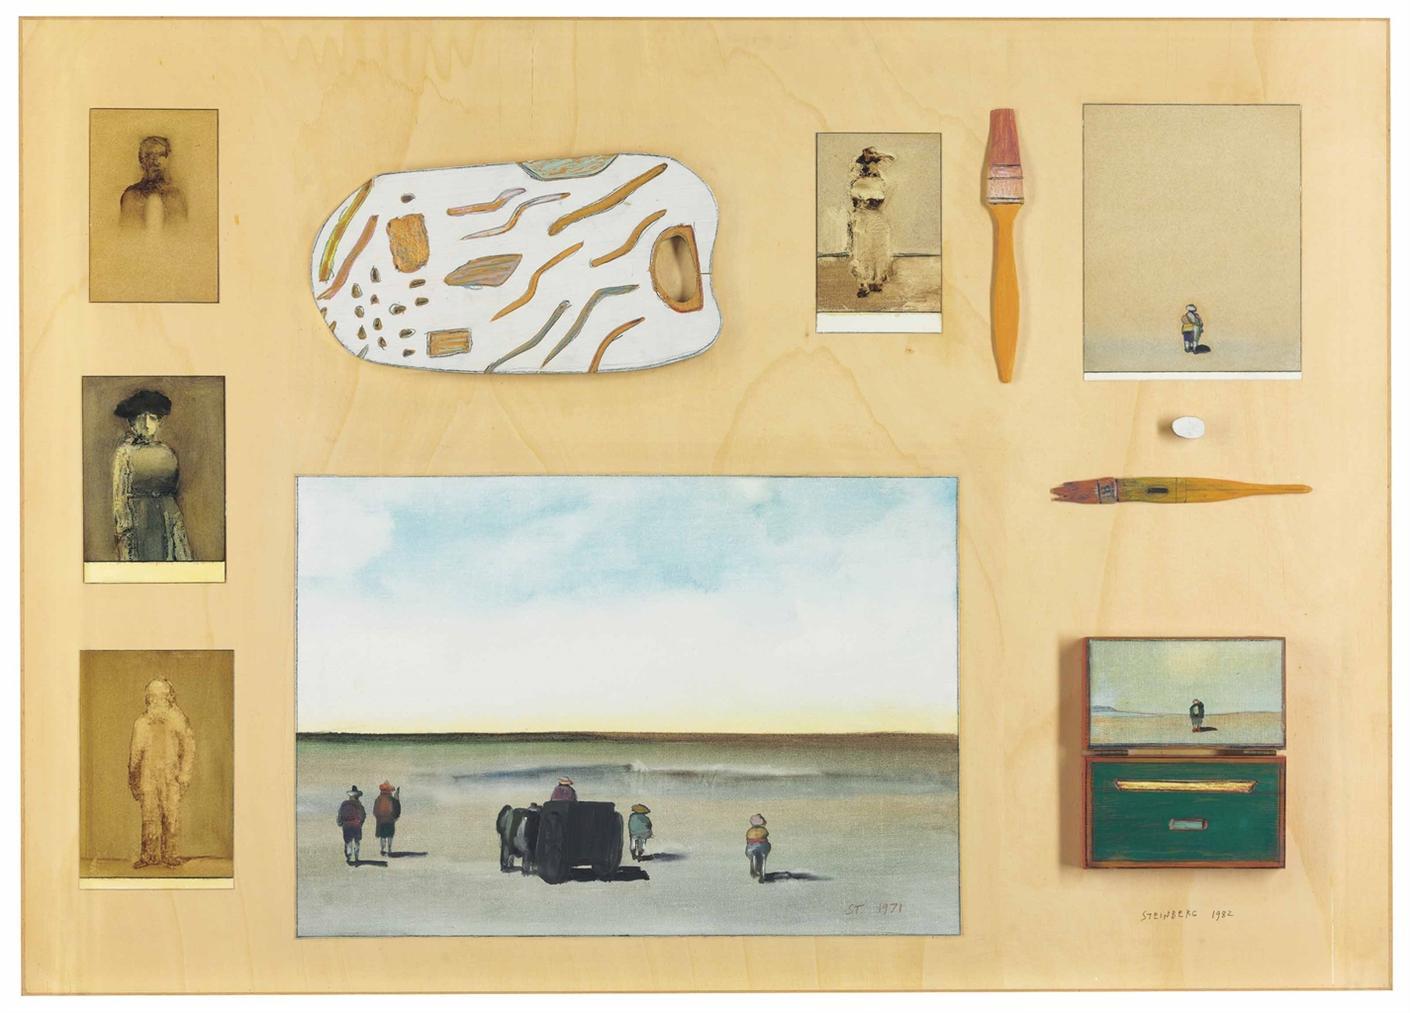 Saul Steinberg-Travel Table-1982